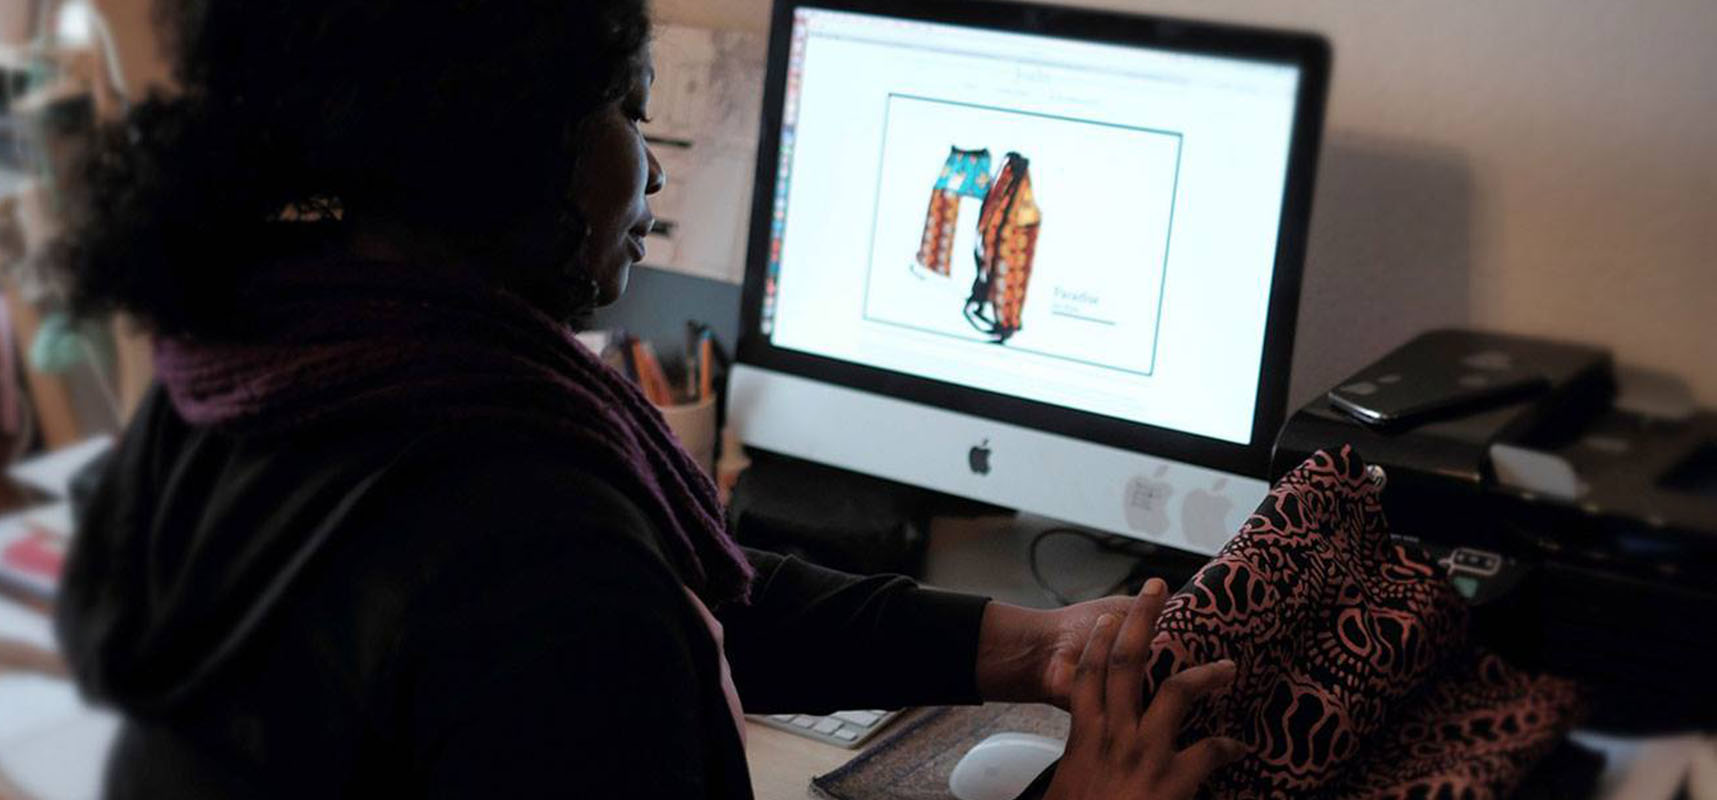 Joana adesuwa reiterer designing